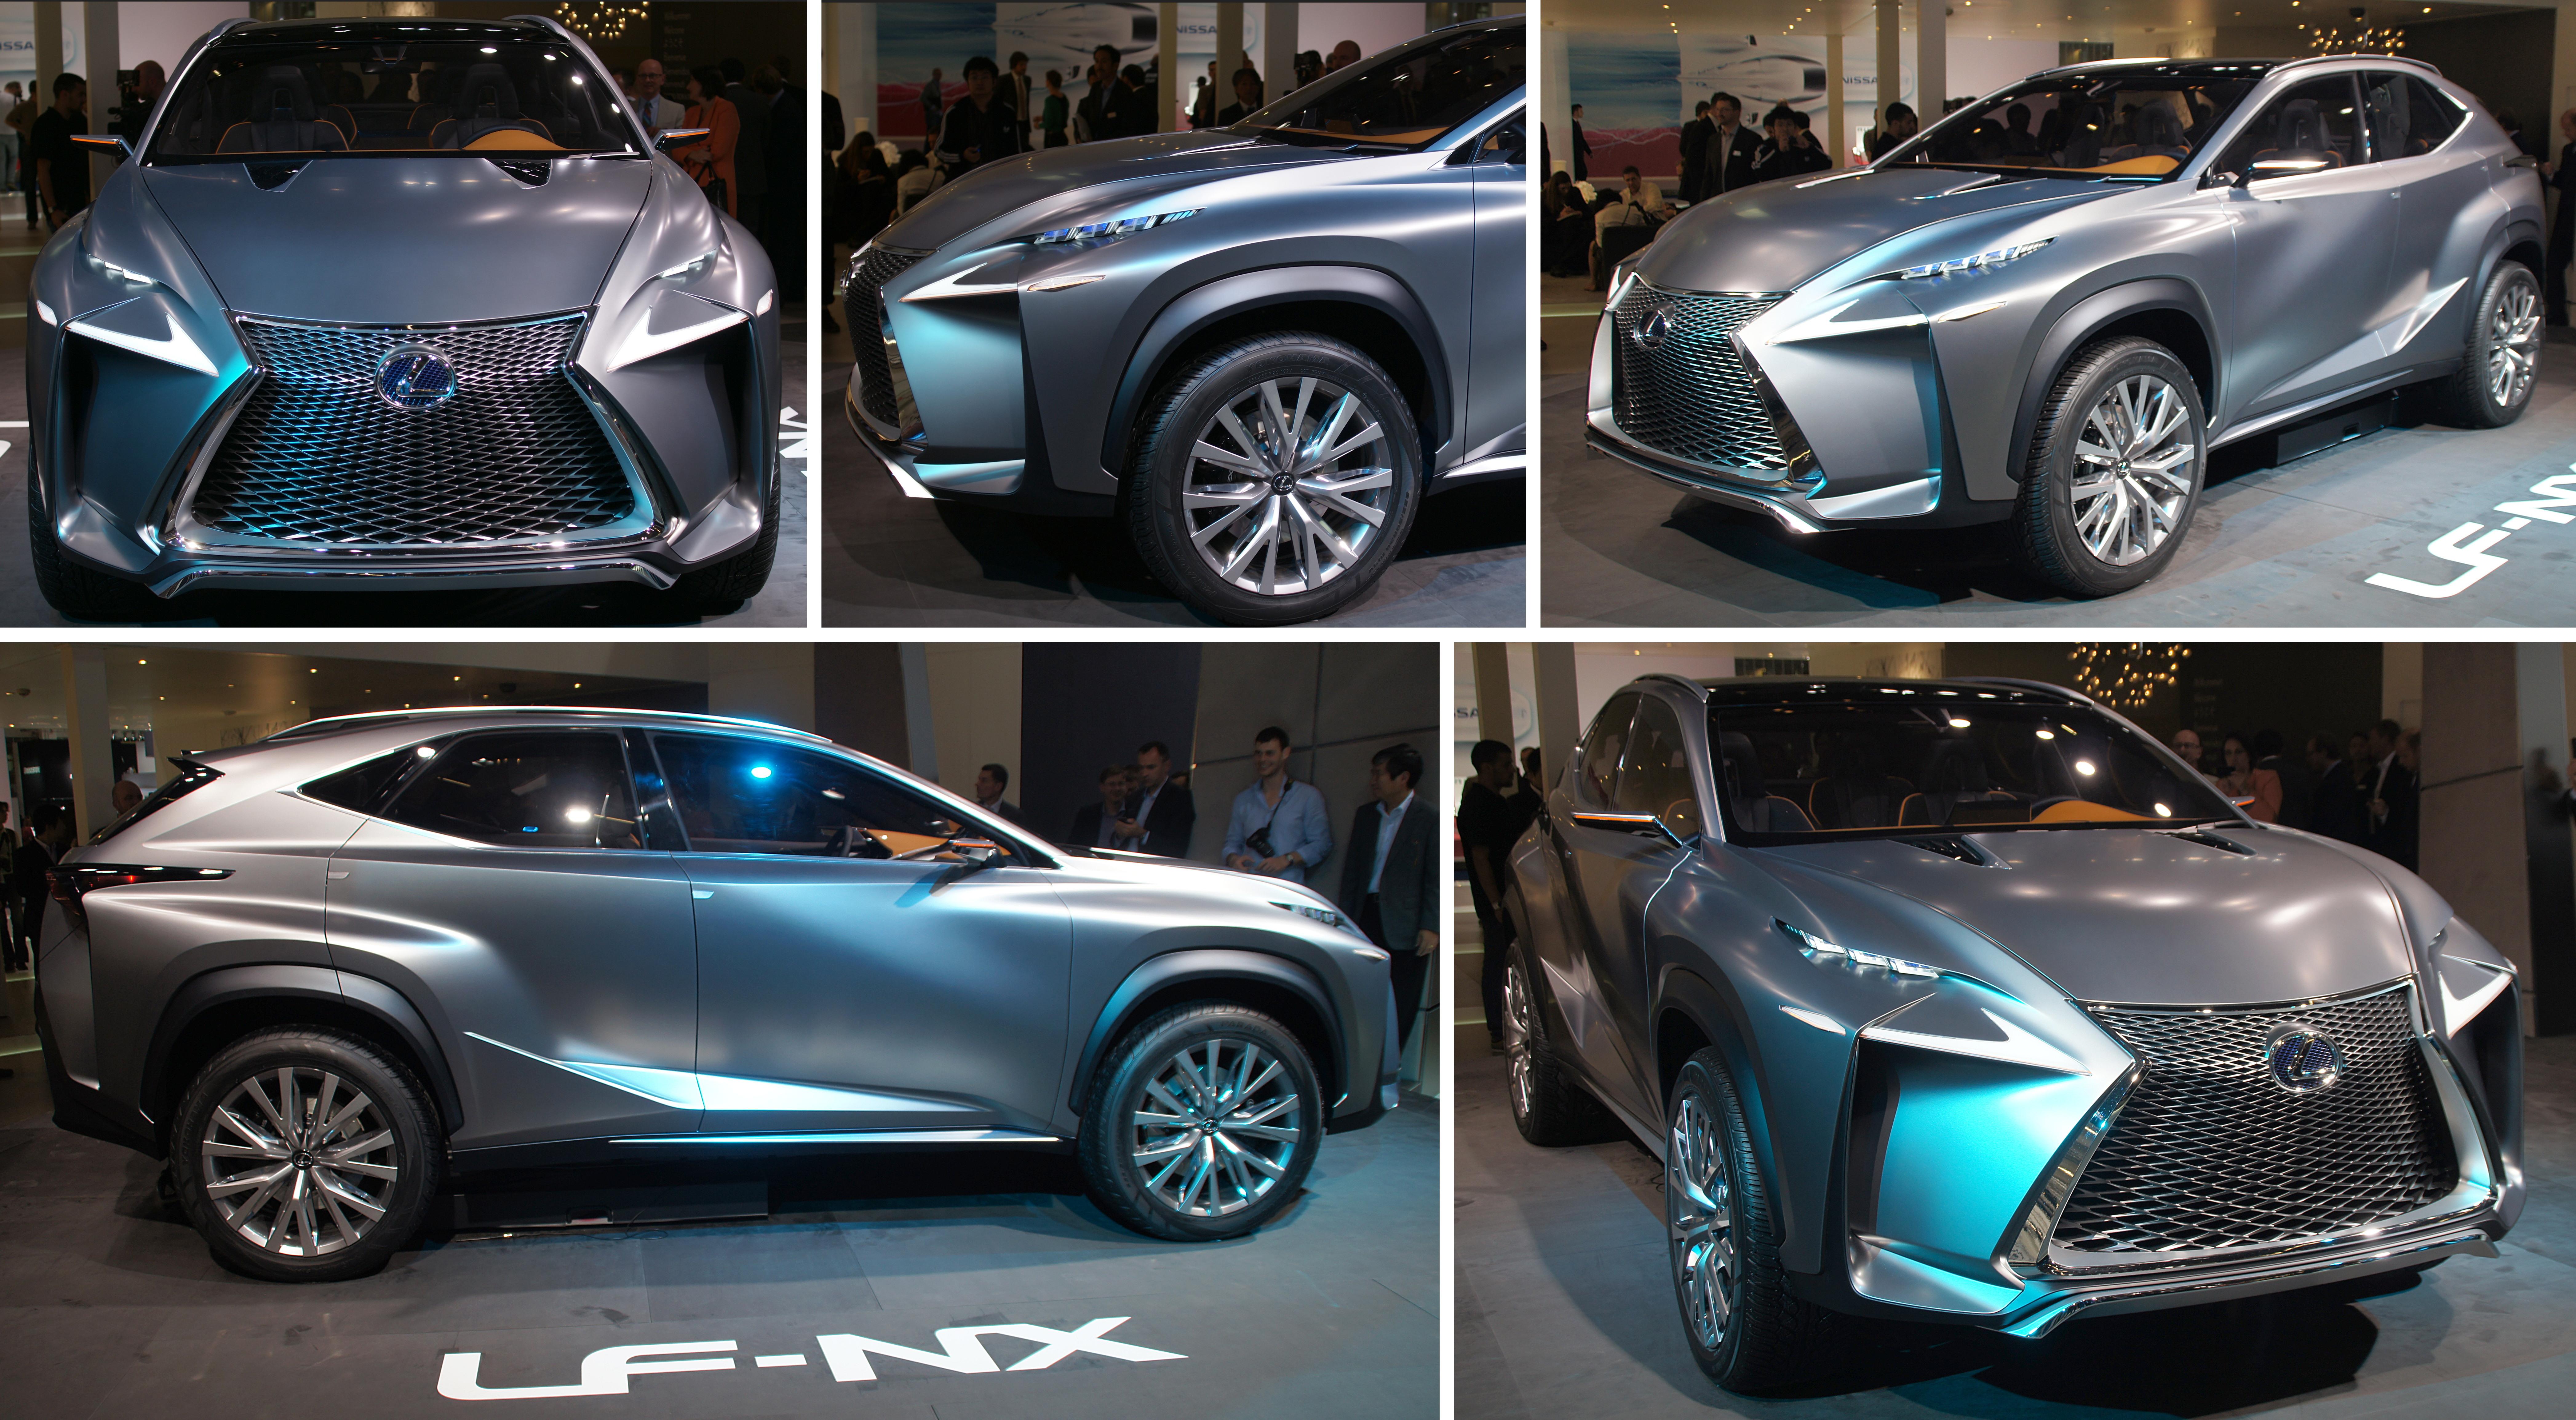 https://upload.wikimedia.org/wikipedia/commons/7/7f/Lexus_LF-NX_wiki.JPG